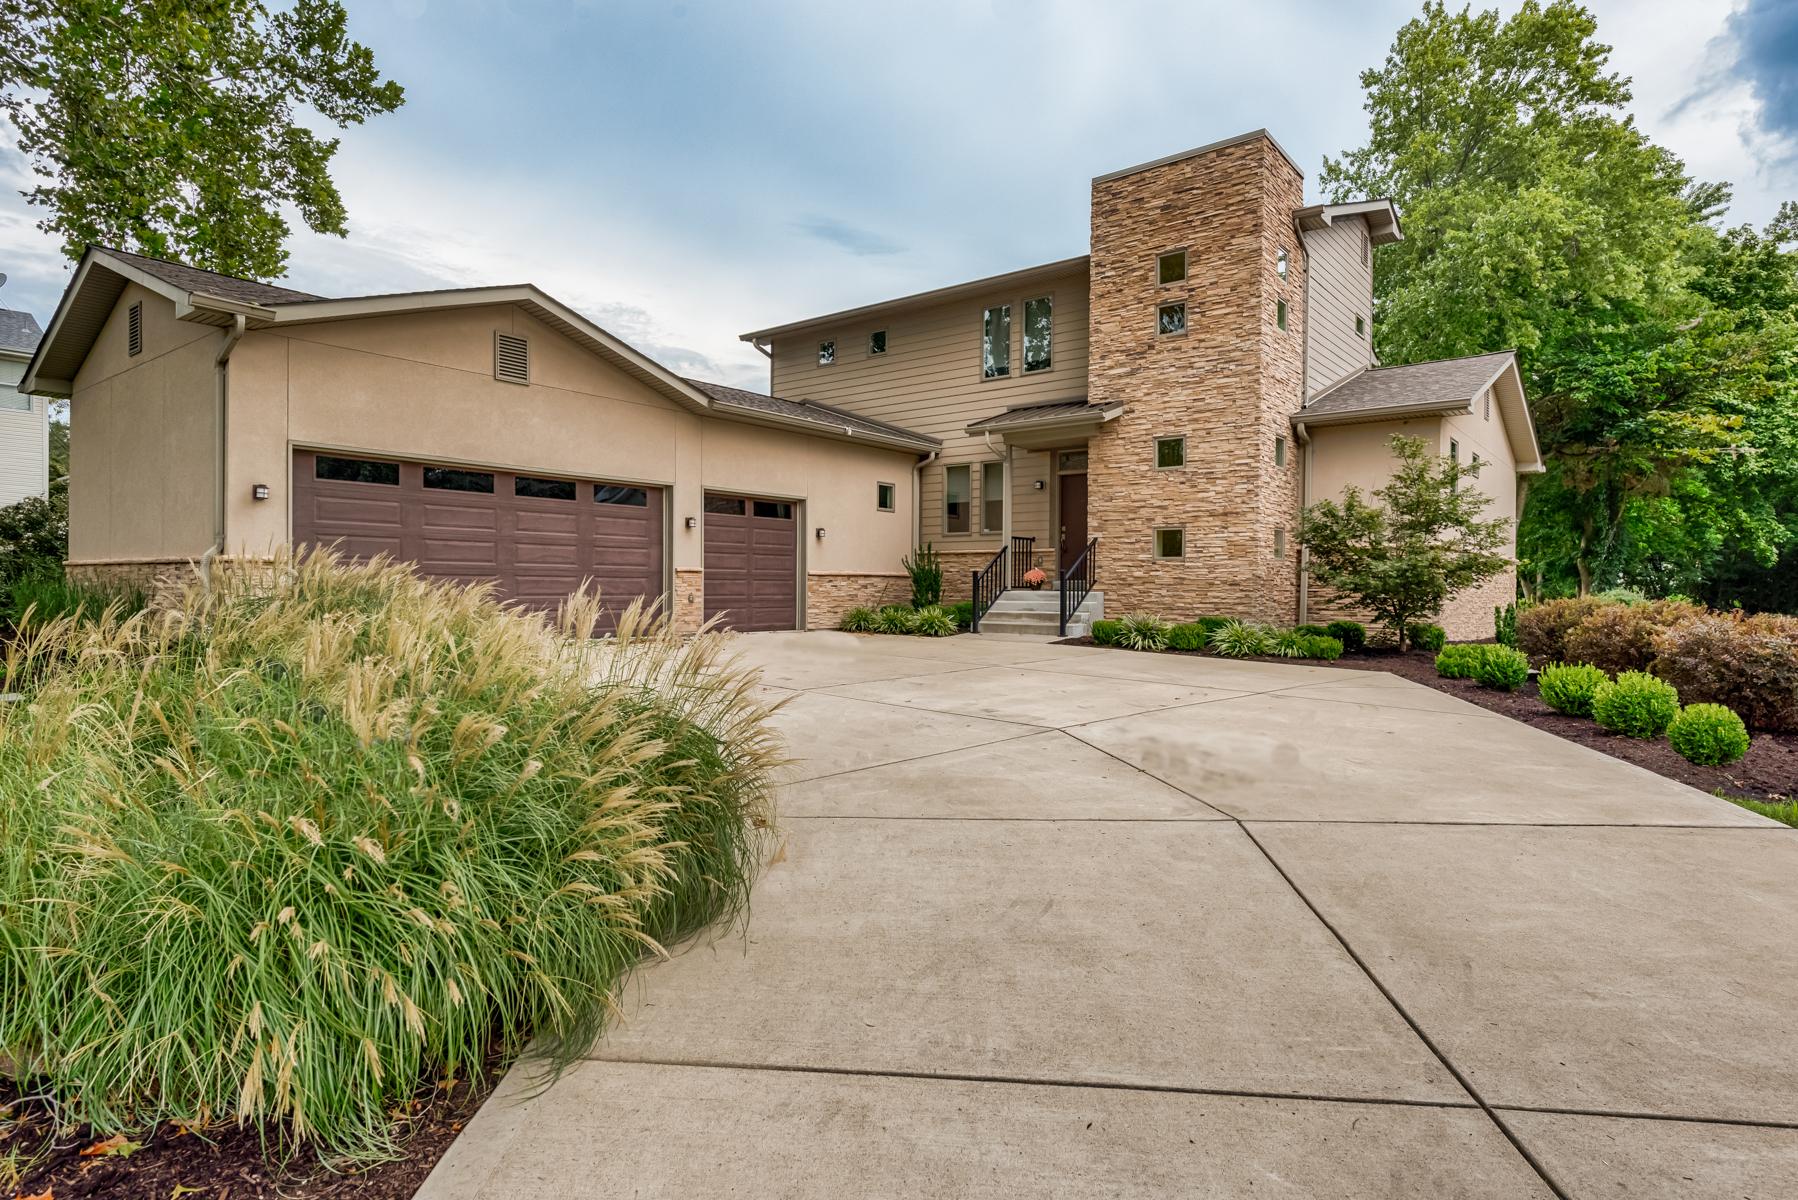 Casa para uma família para Venda às Clarjon Drive 2368 Clarjon Drive Ballwin, Missouri, 63021 Estados Unidos